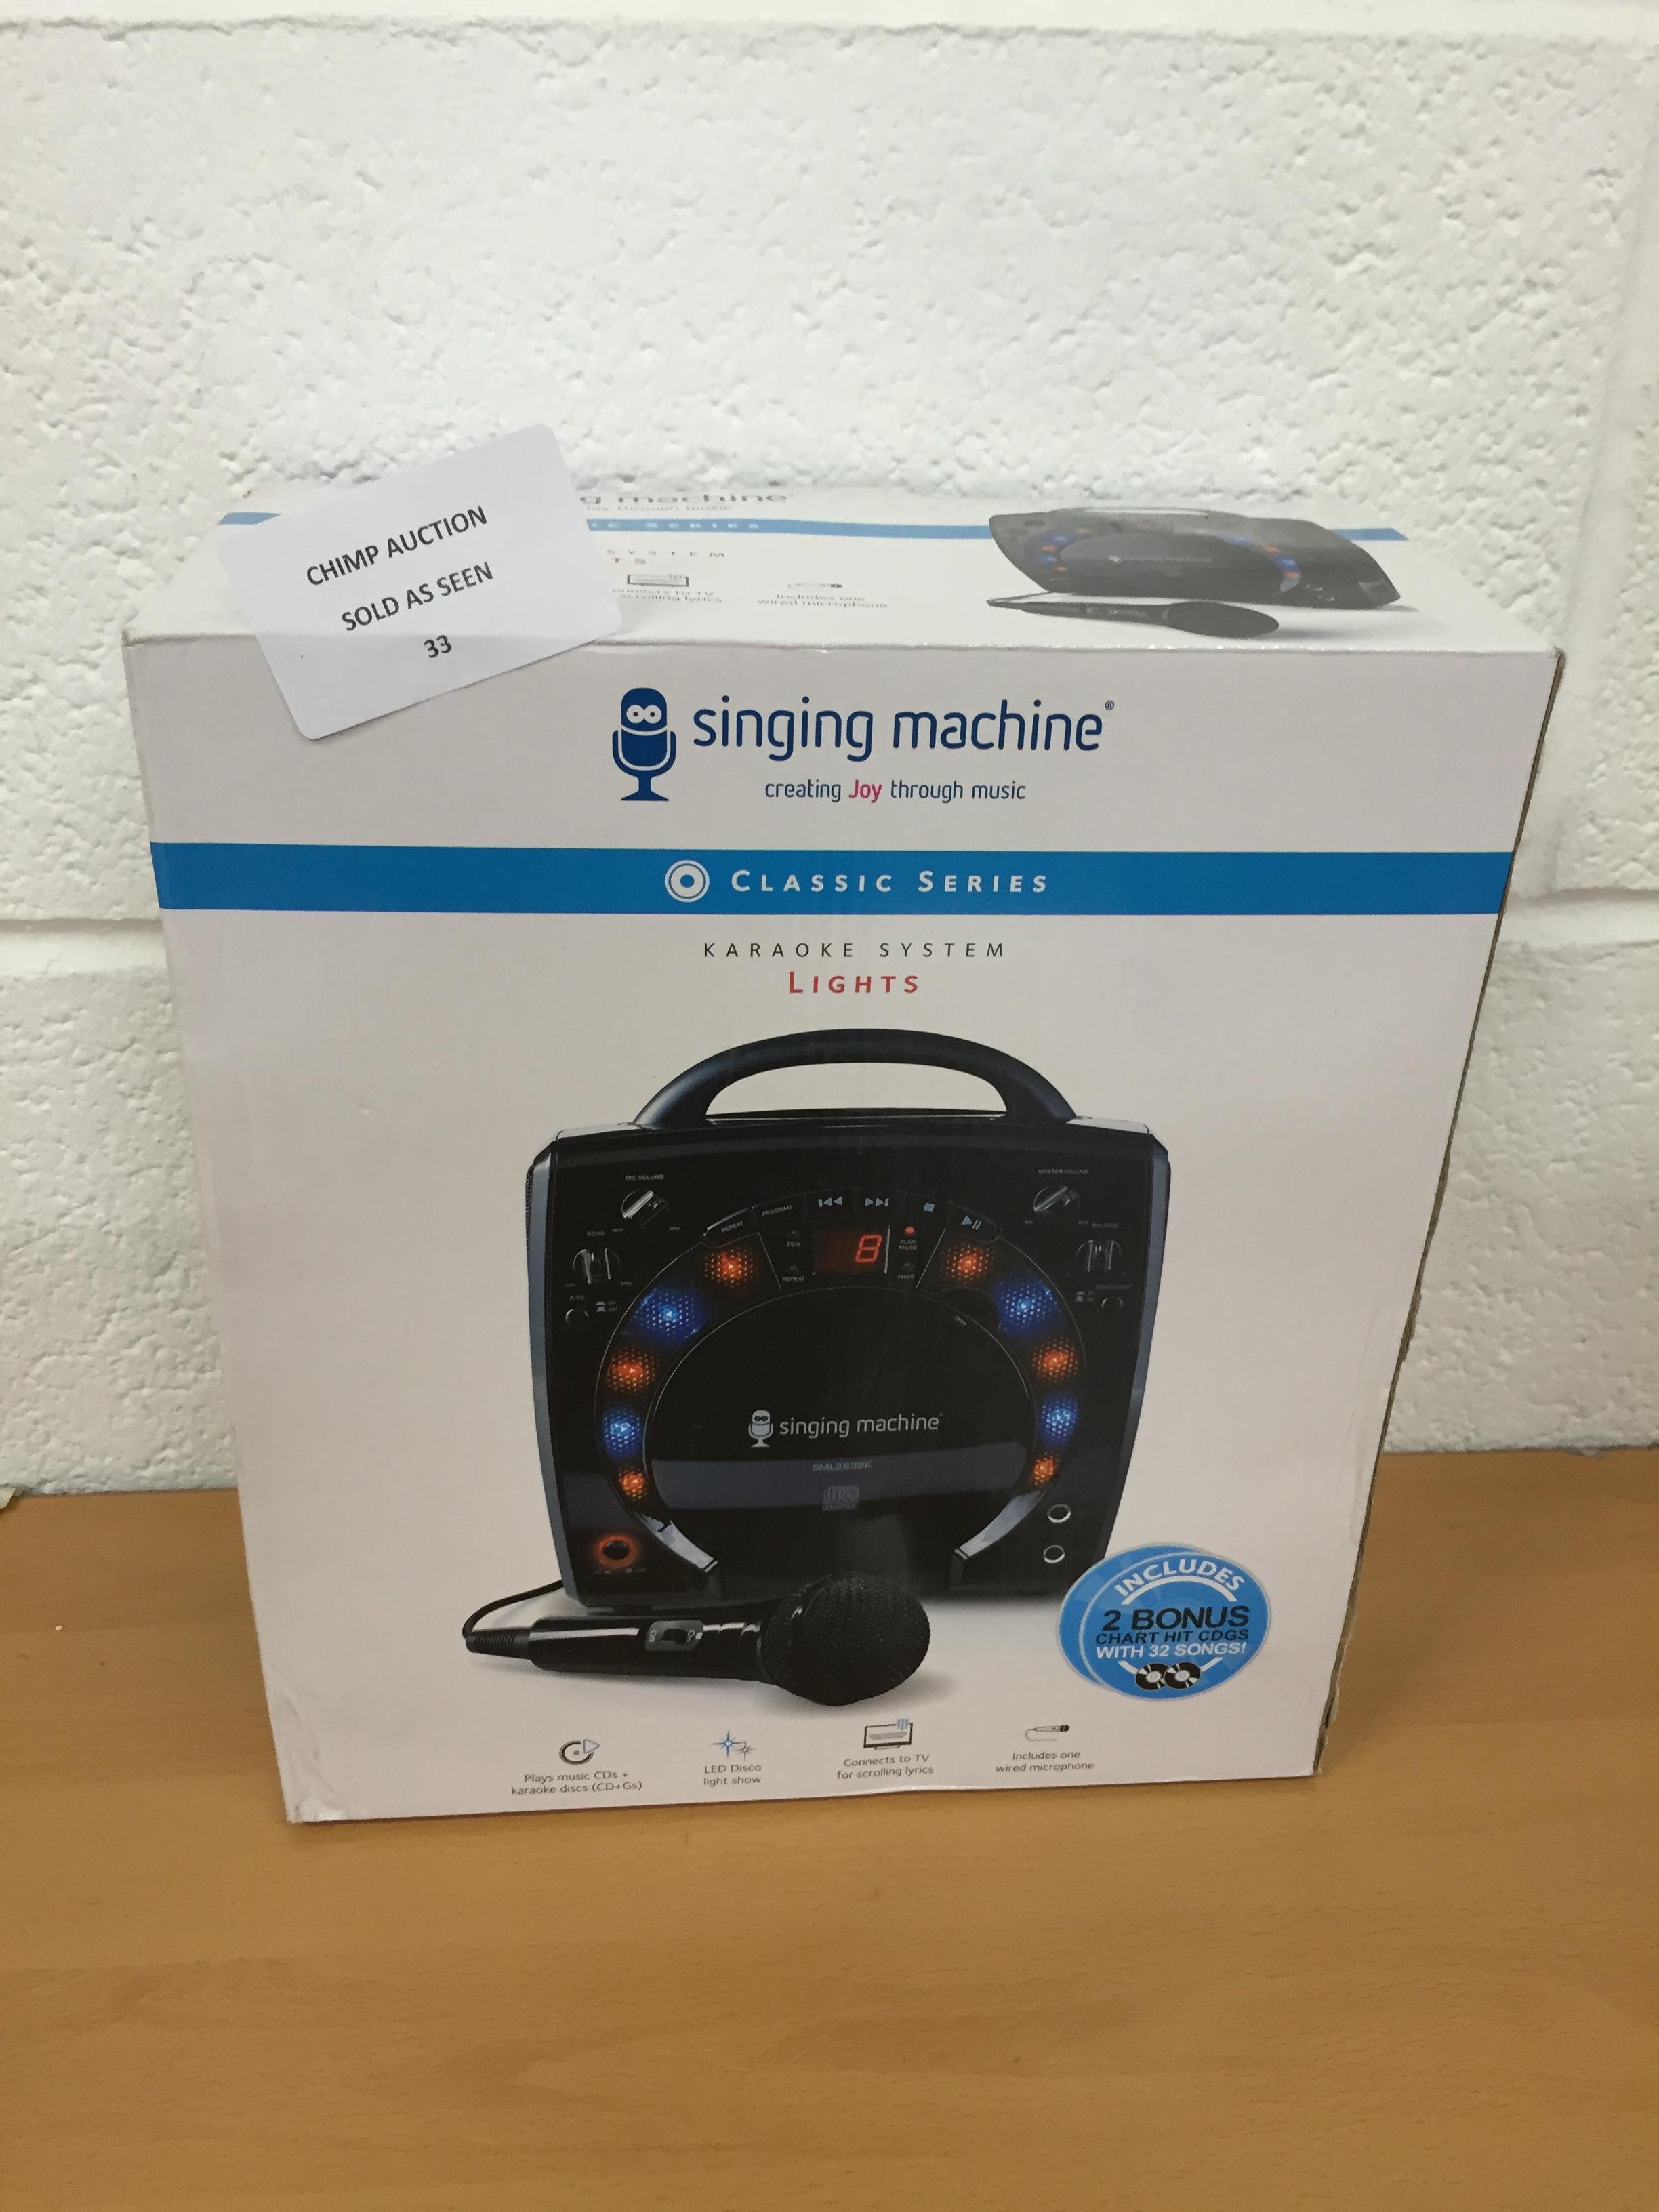 Lot 33 - Singing Machine Classic series karaoke system